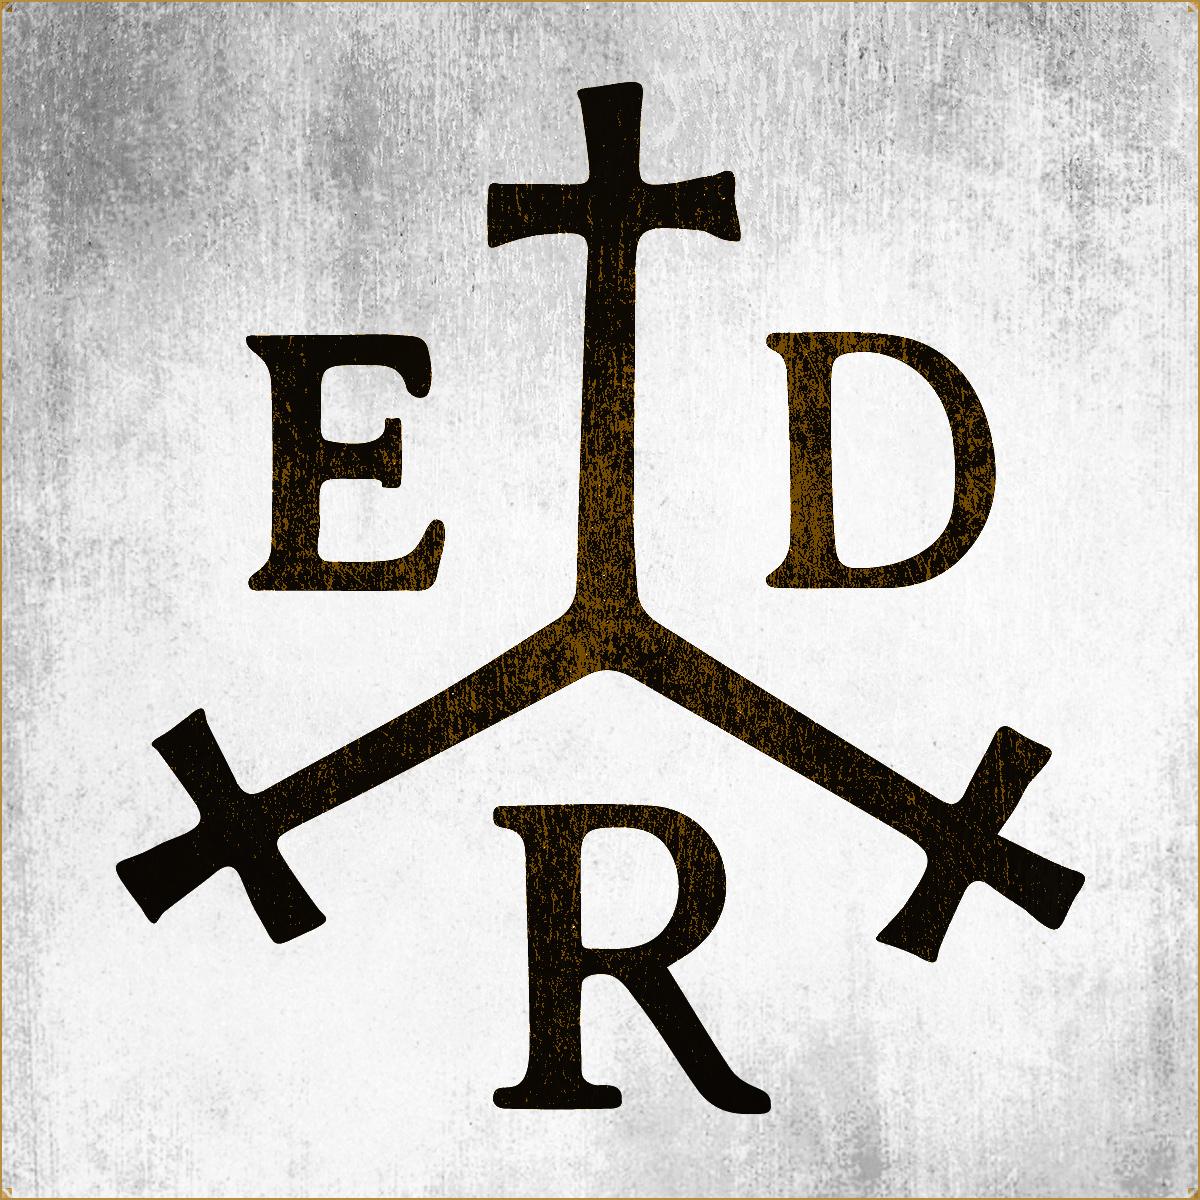 BricolArts - Artist profile picture - Ellie logo